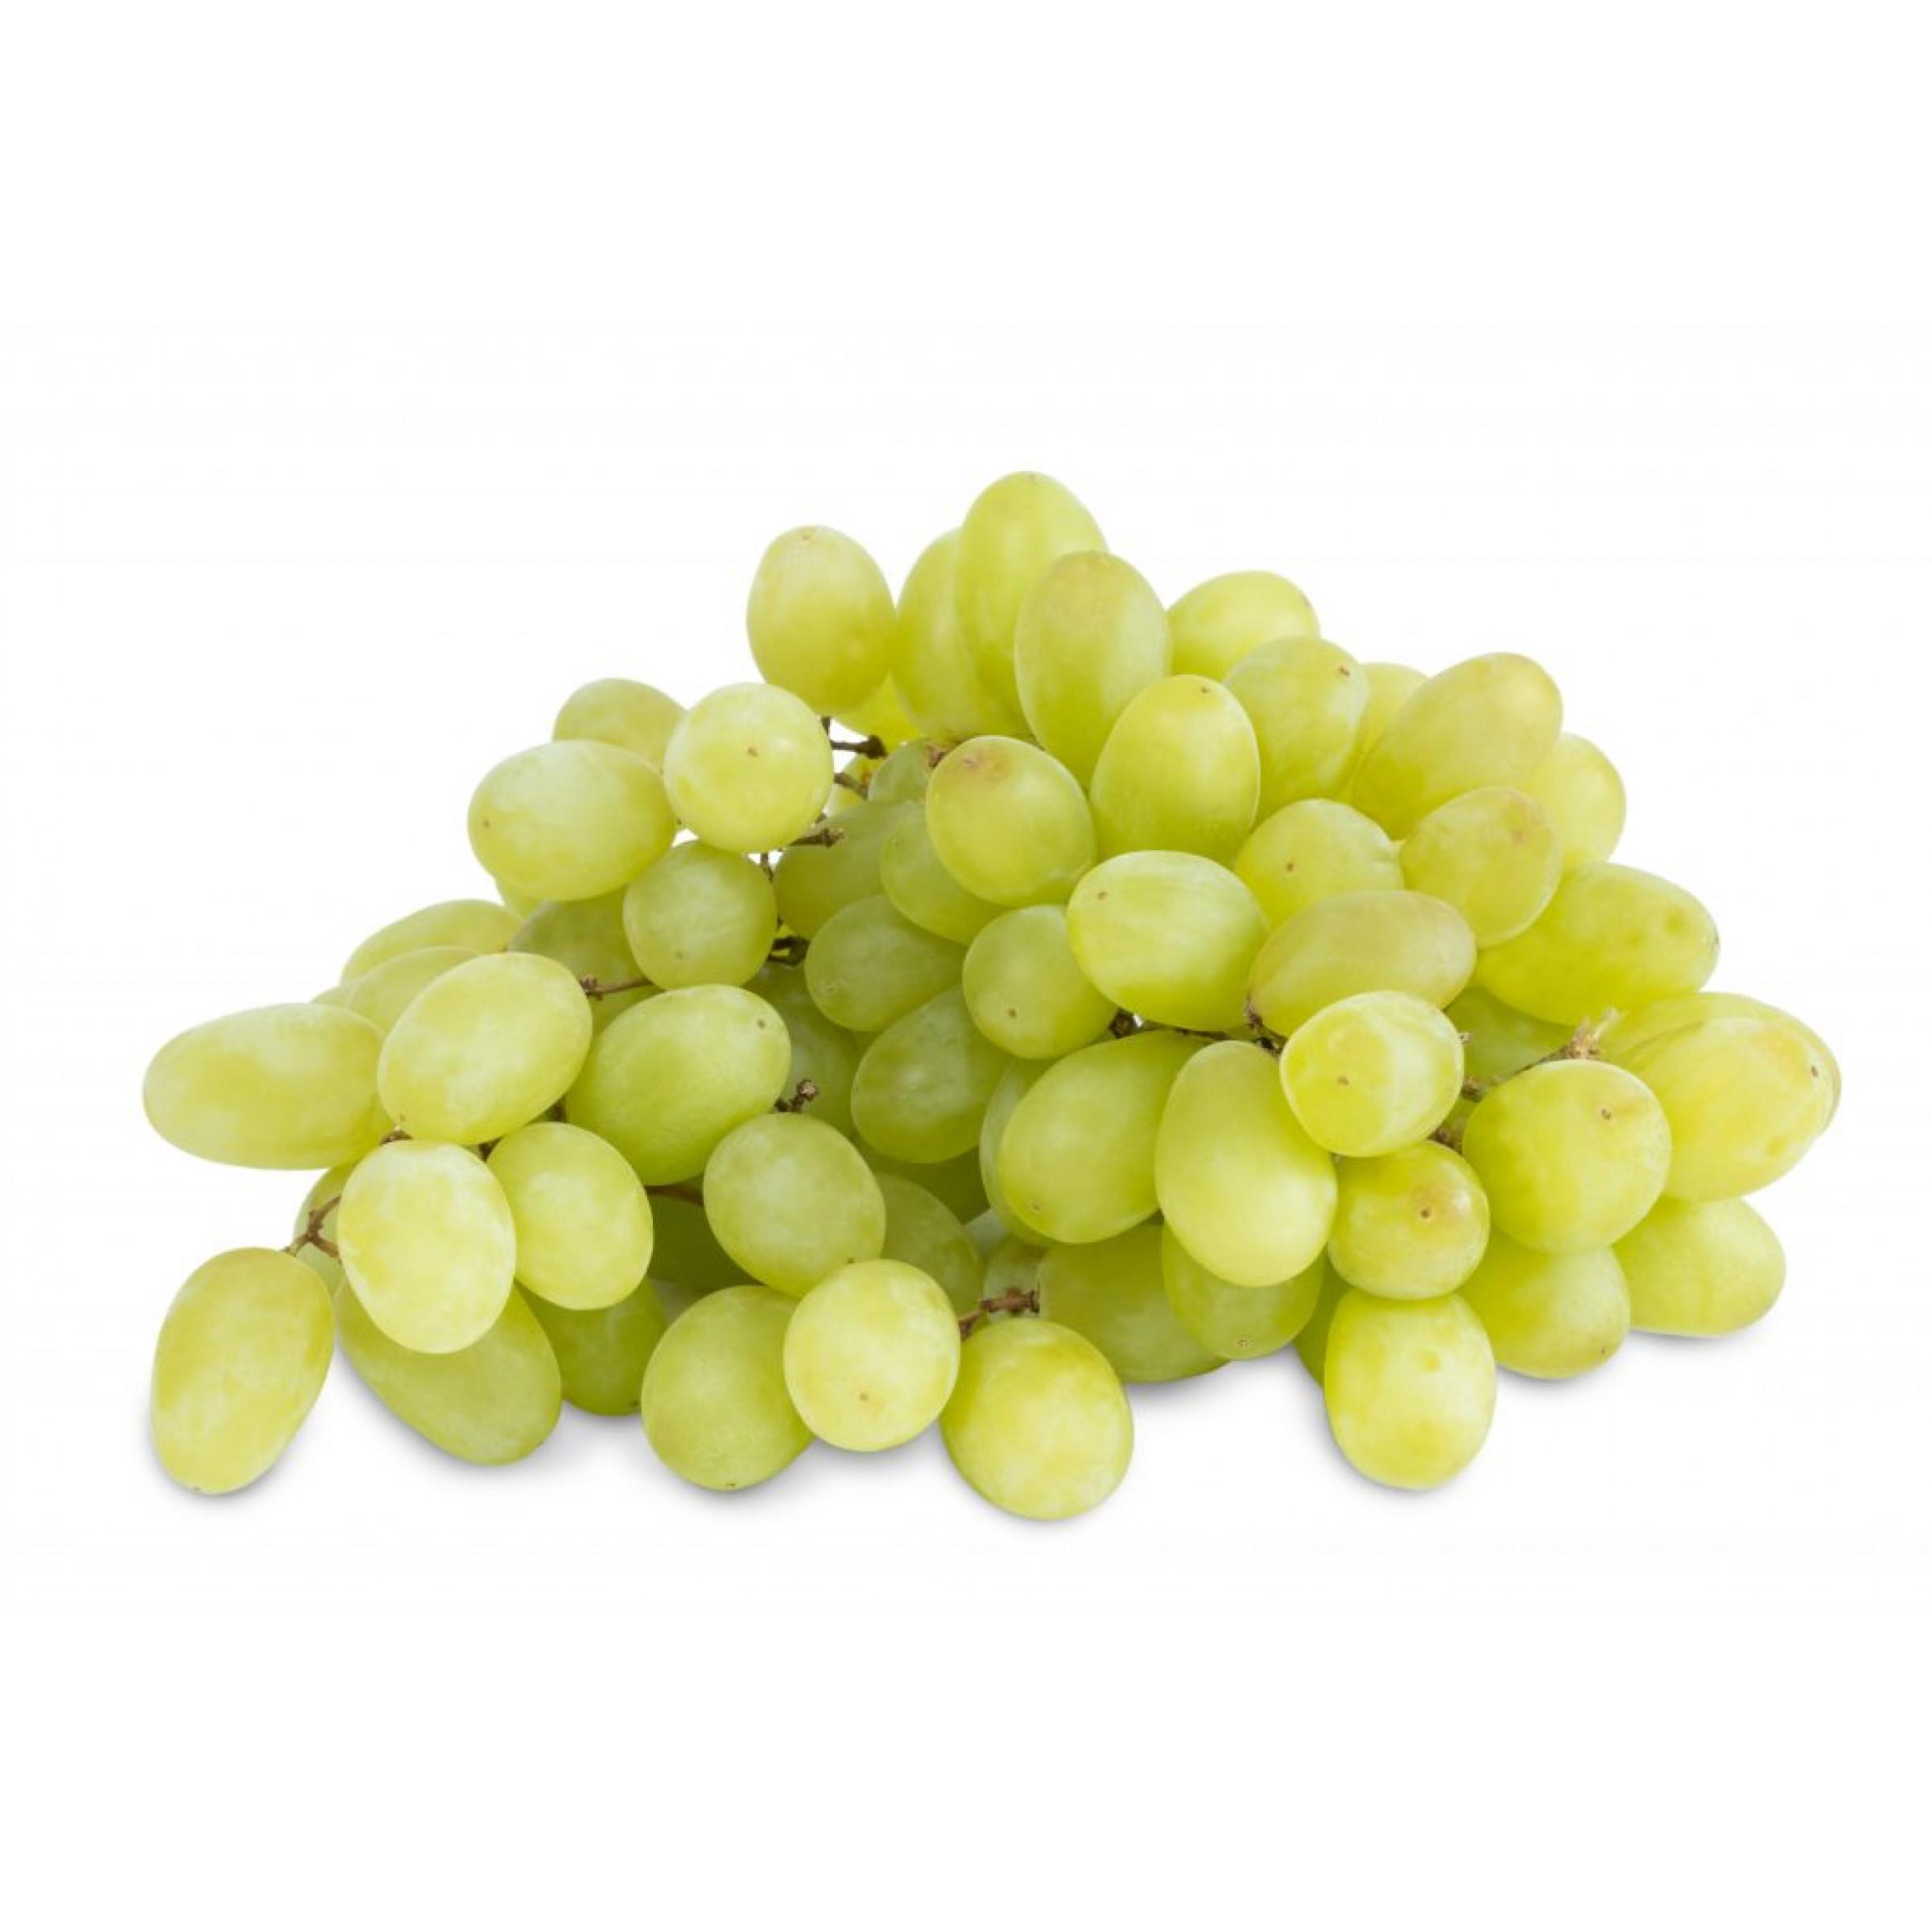 Виноград белый Киш-миш, 600 гр